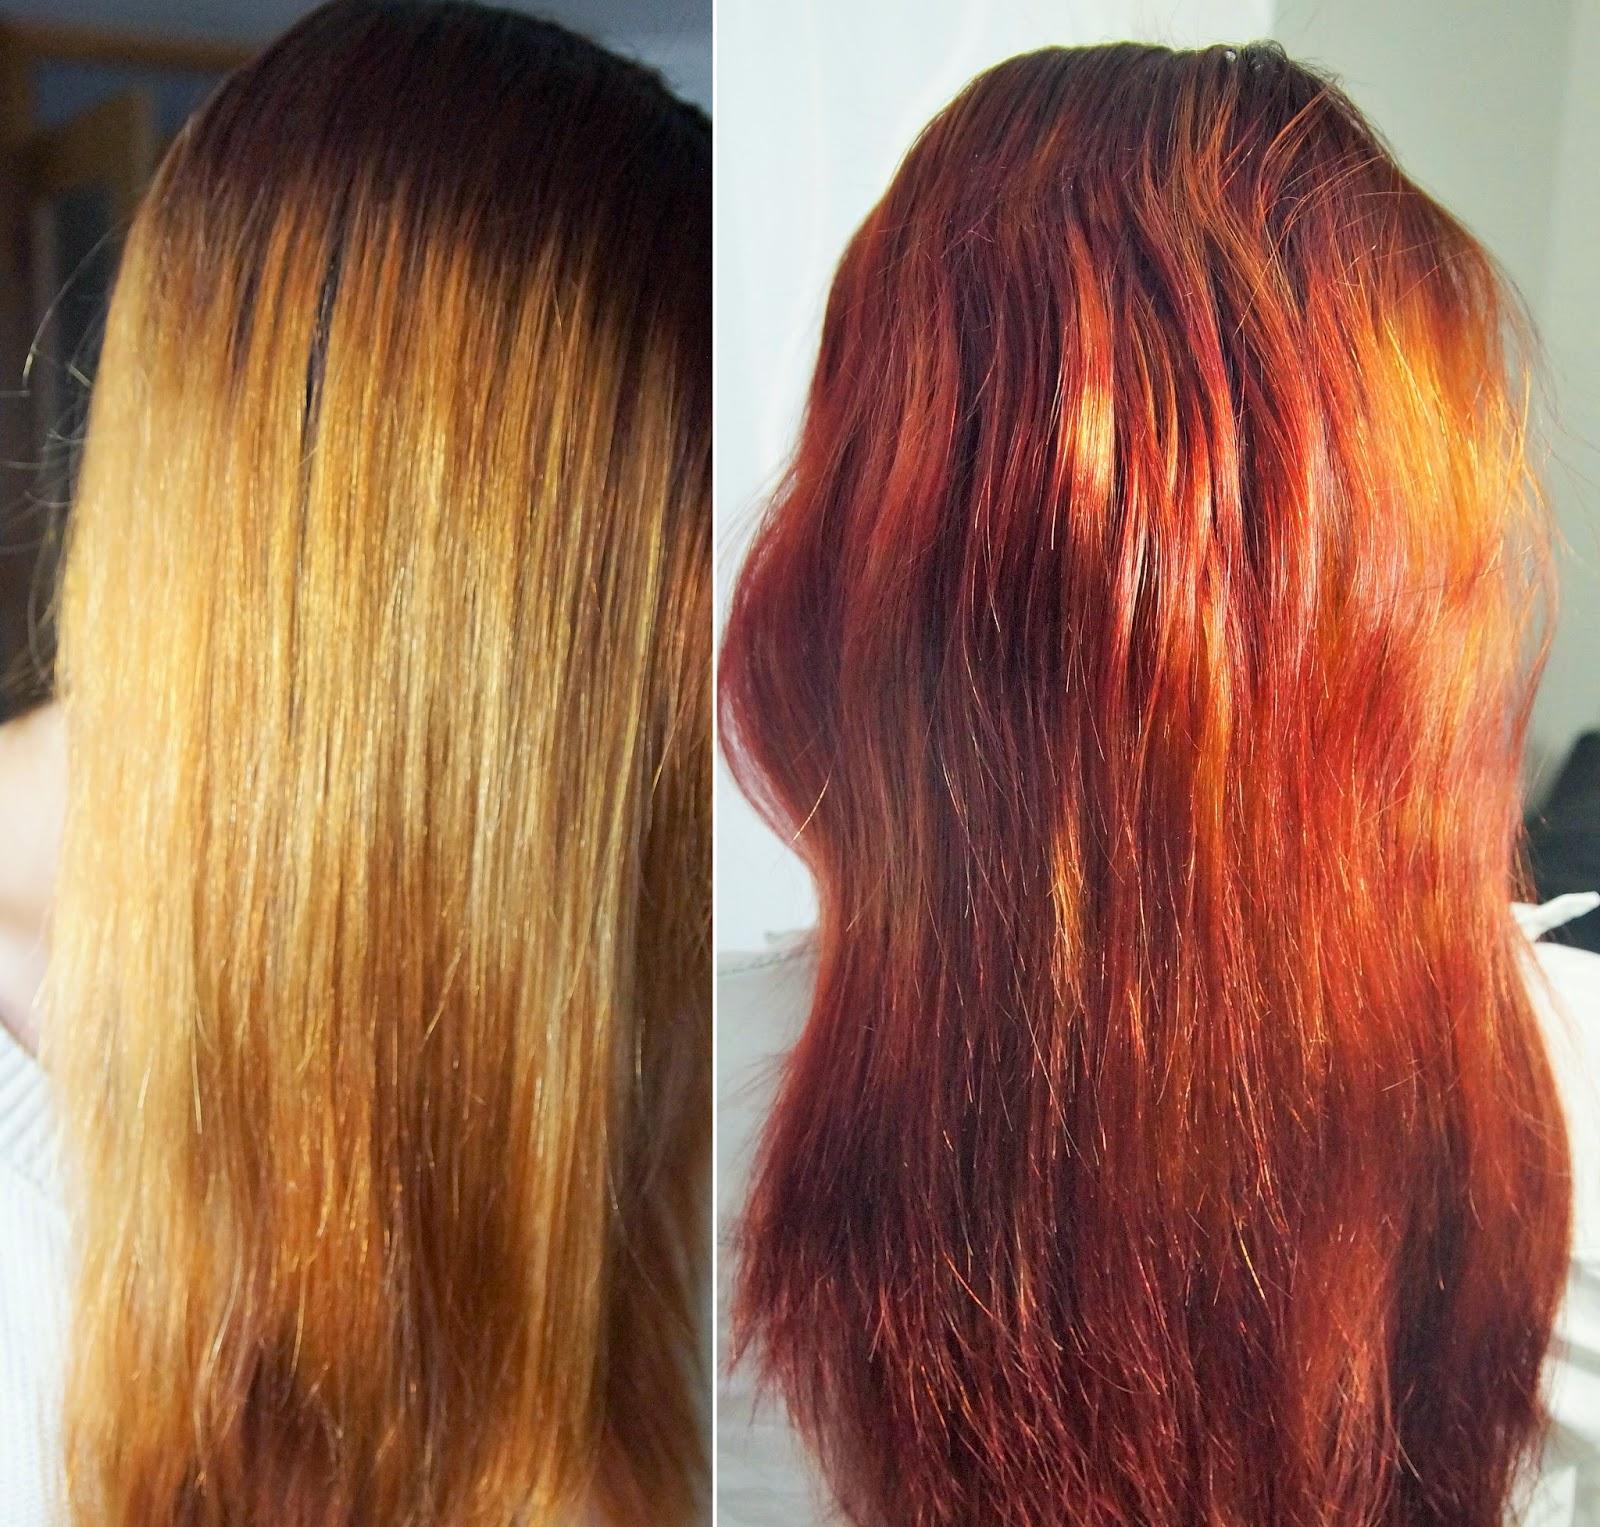 Neue Haarfarbe Garnier Olia Farbkraft Durch öl Kaschmirrot